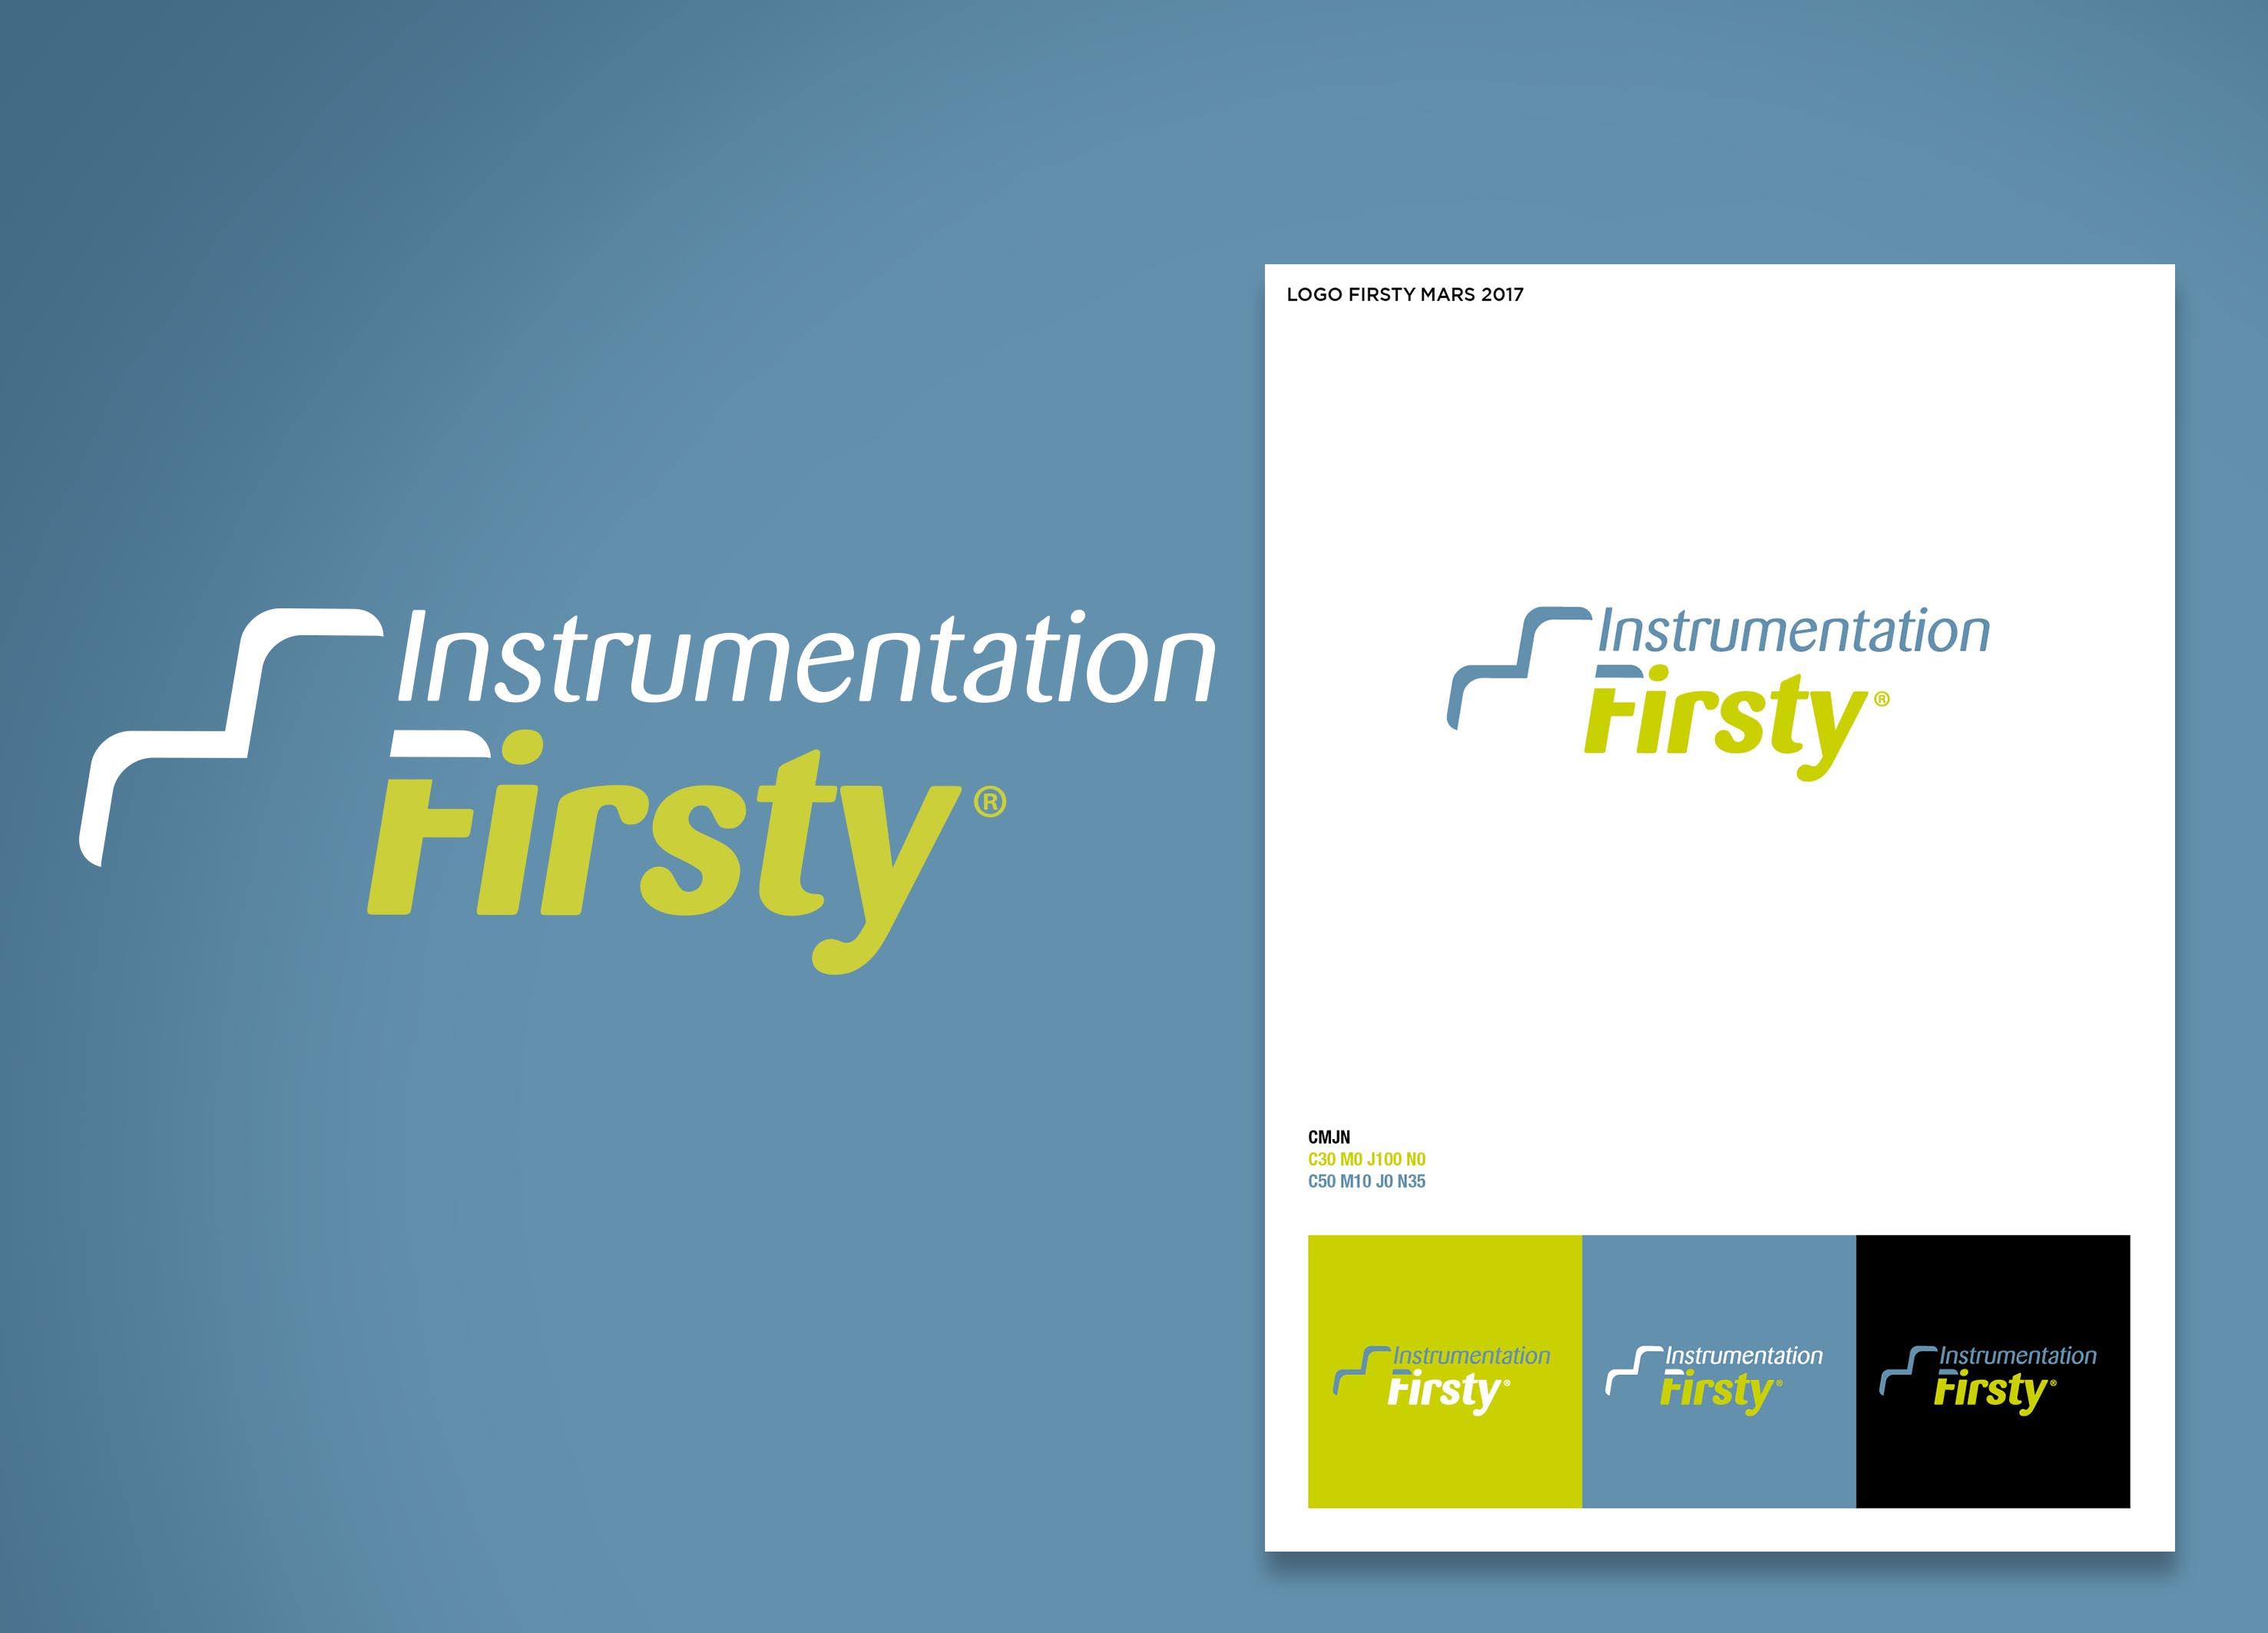 FIRSTY INSTRUMENTATION